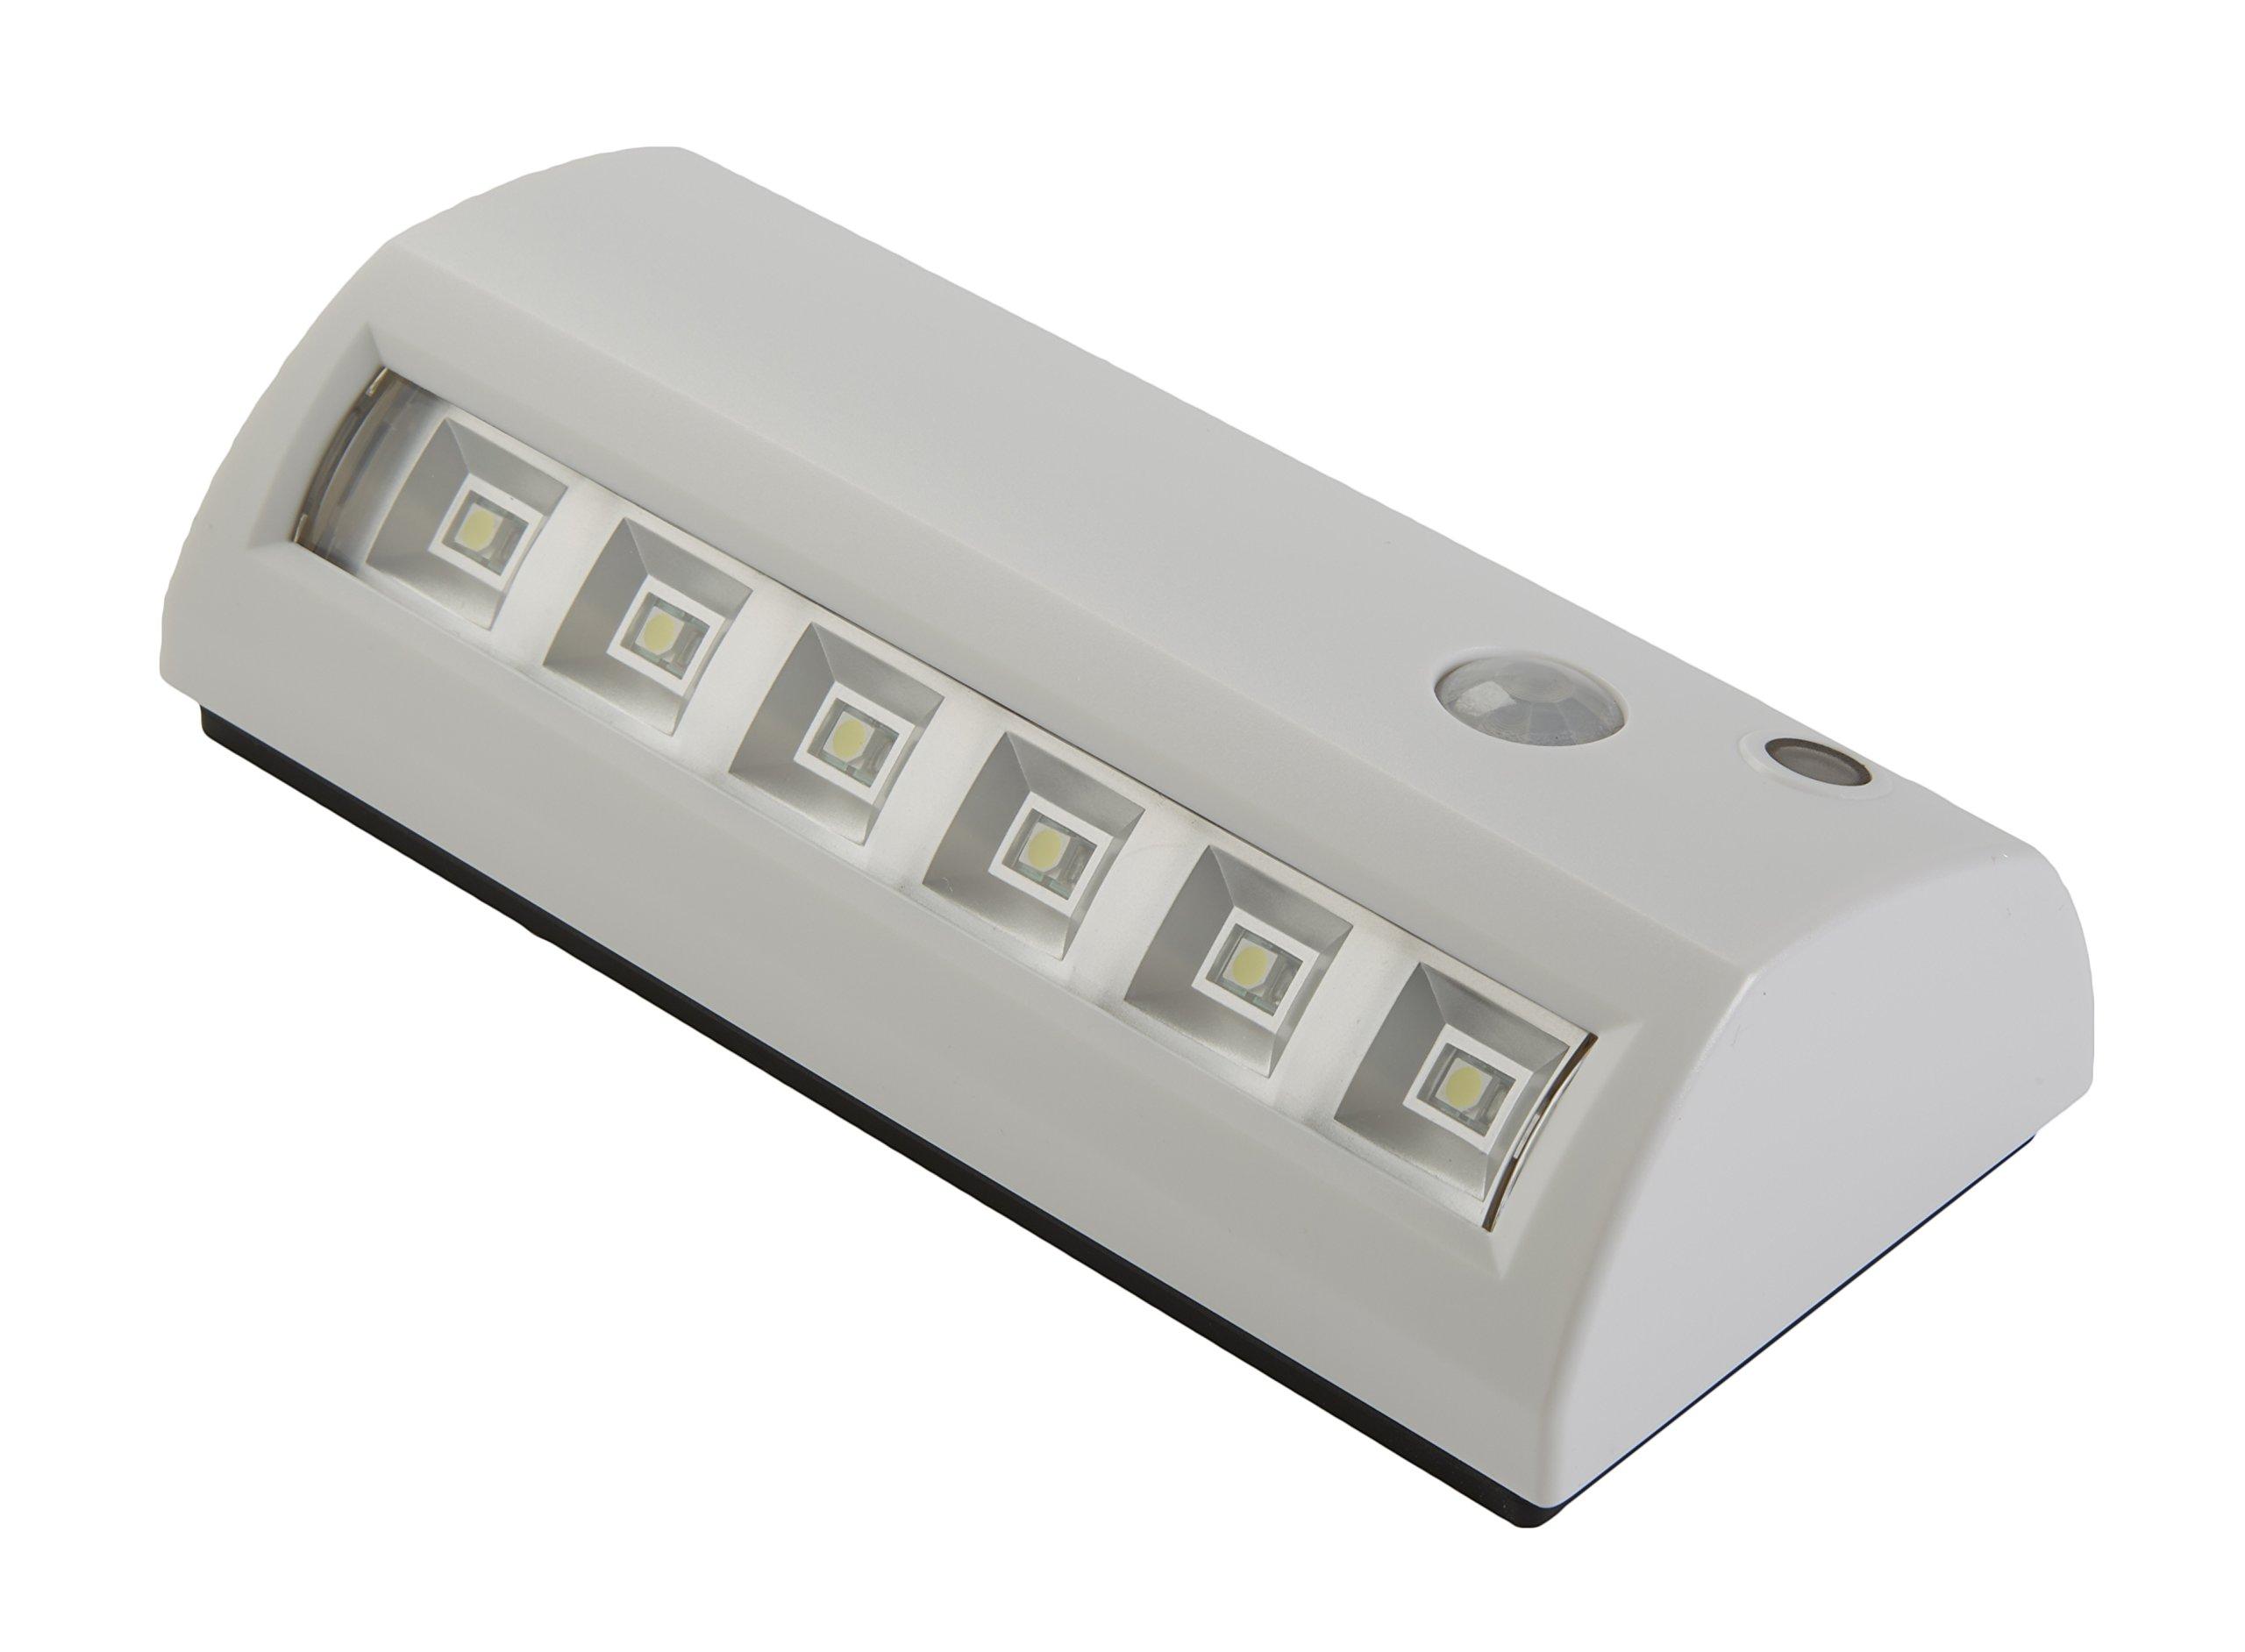 Light It! By Fulcrum 20032-308, LED Wireless Motion Sensor  Weatherproof Light, White